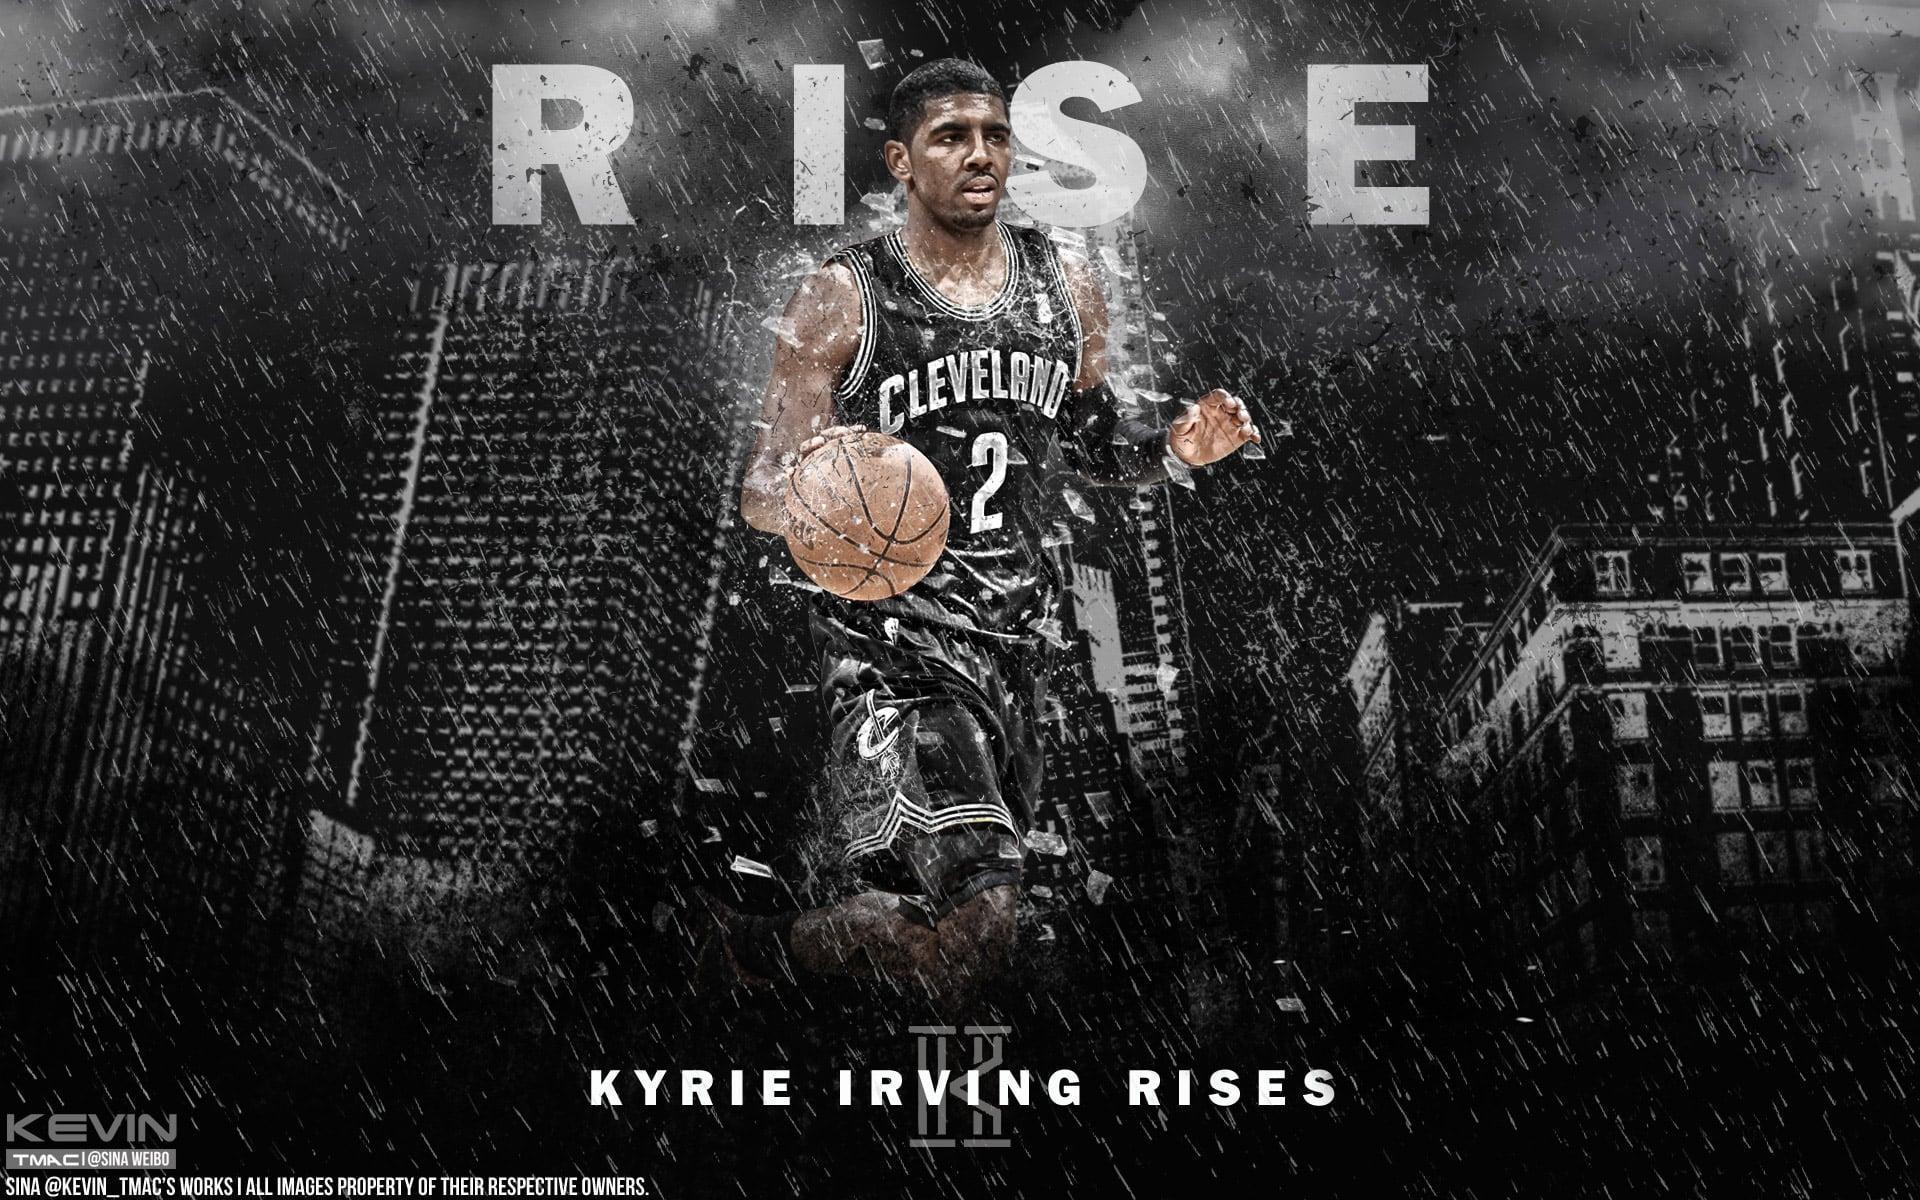 Kyrie Irving Wallpapers - Wallpaper Cave Kyrie Irving Wallpaper Desktop